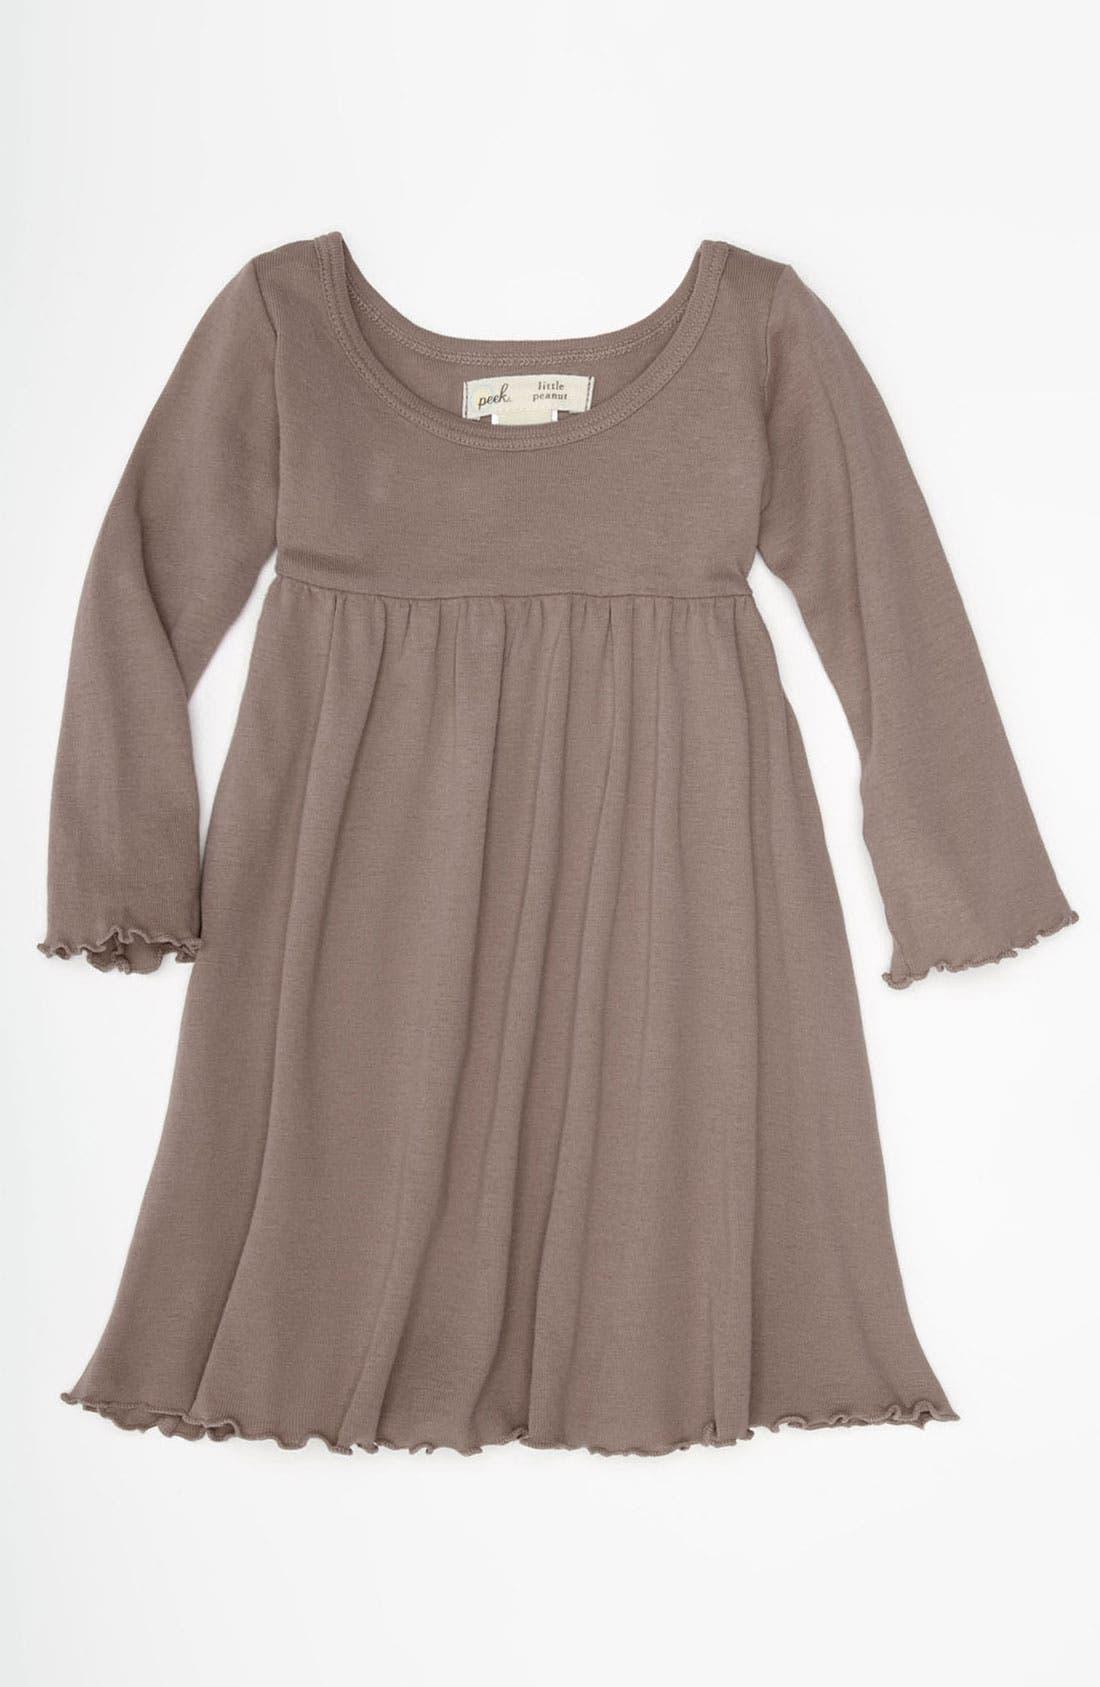 Main Image - Peek 'Little Peanut' Long Sleeve Dress (Baby)